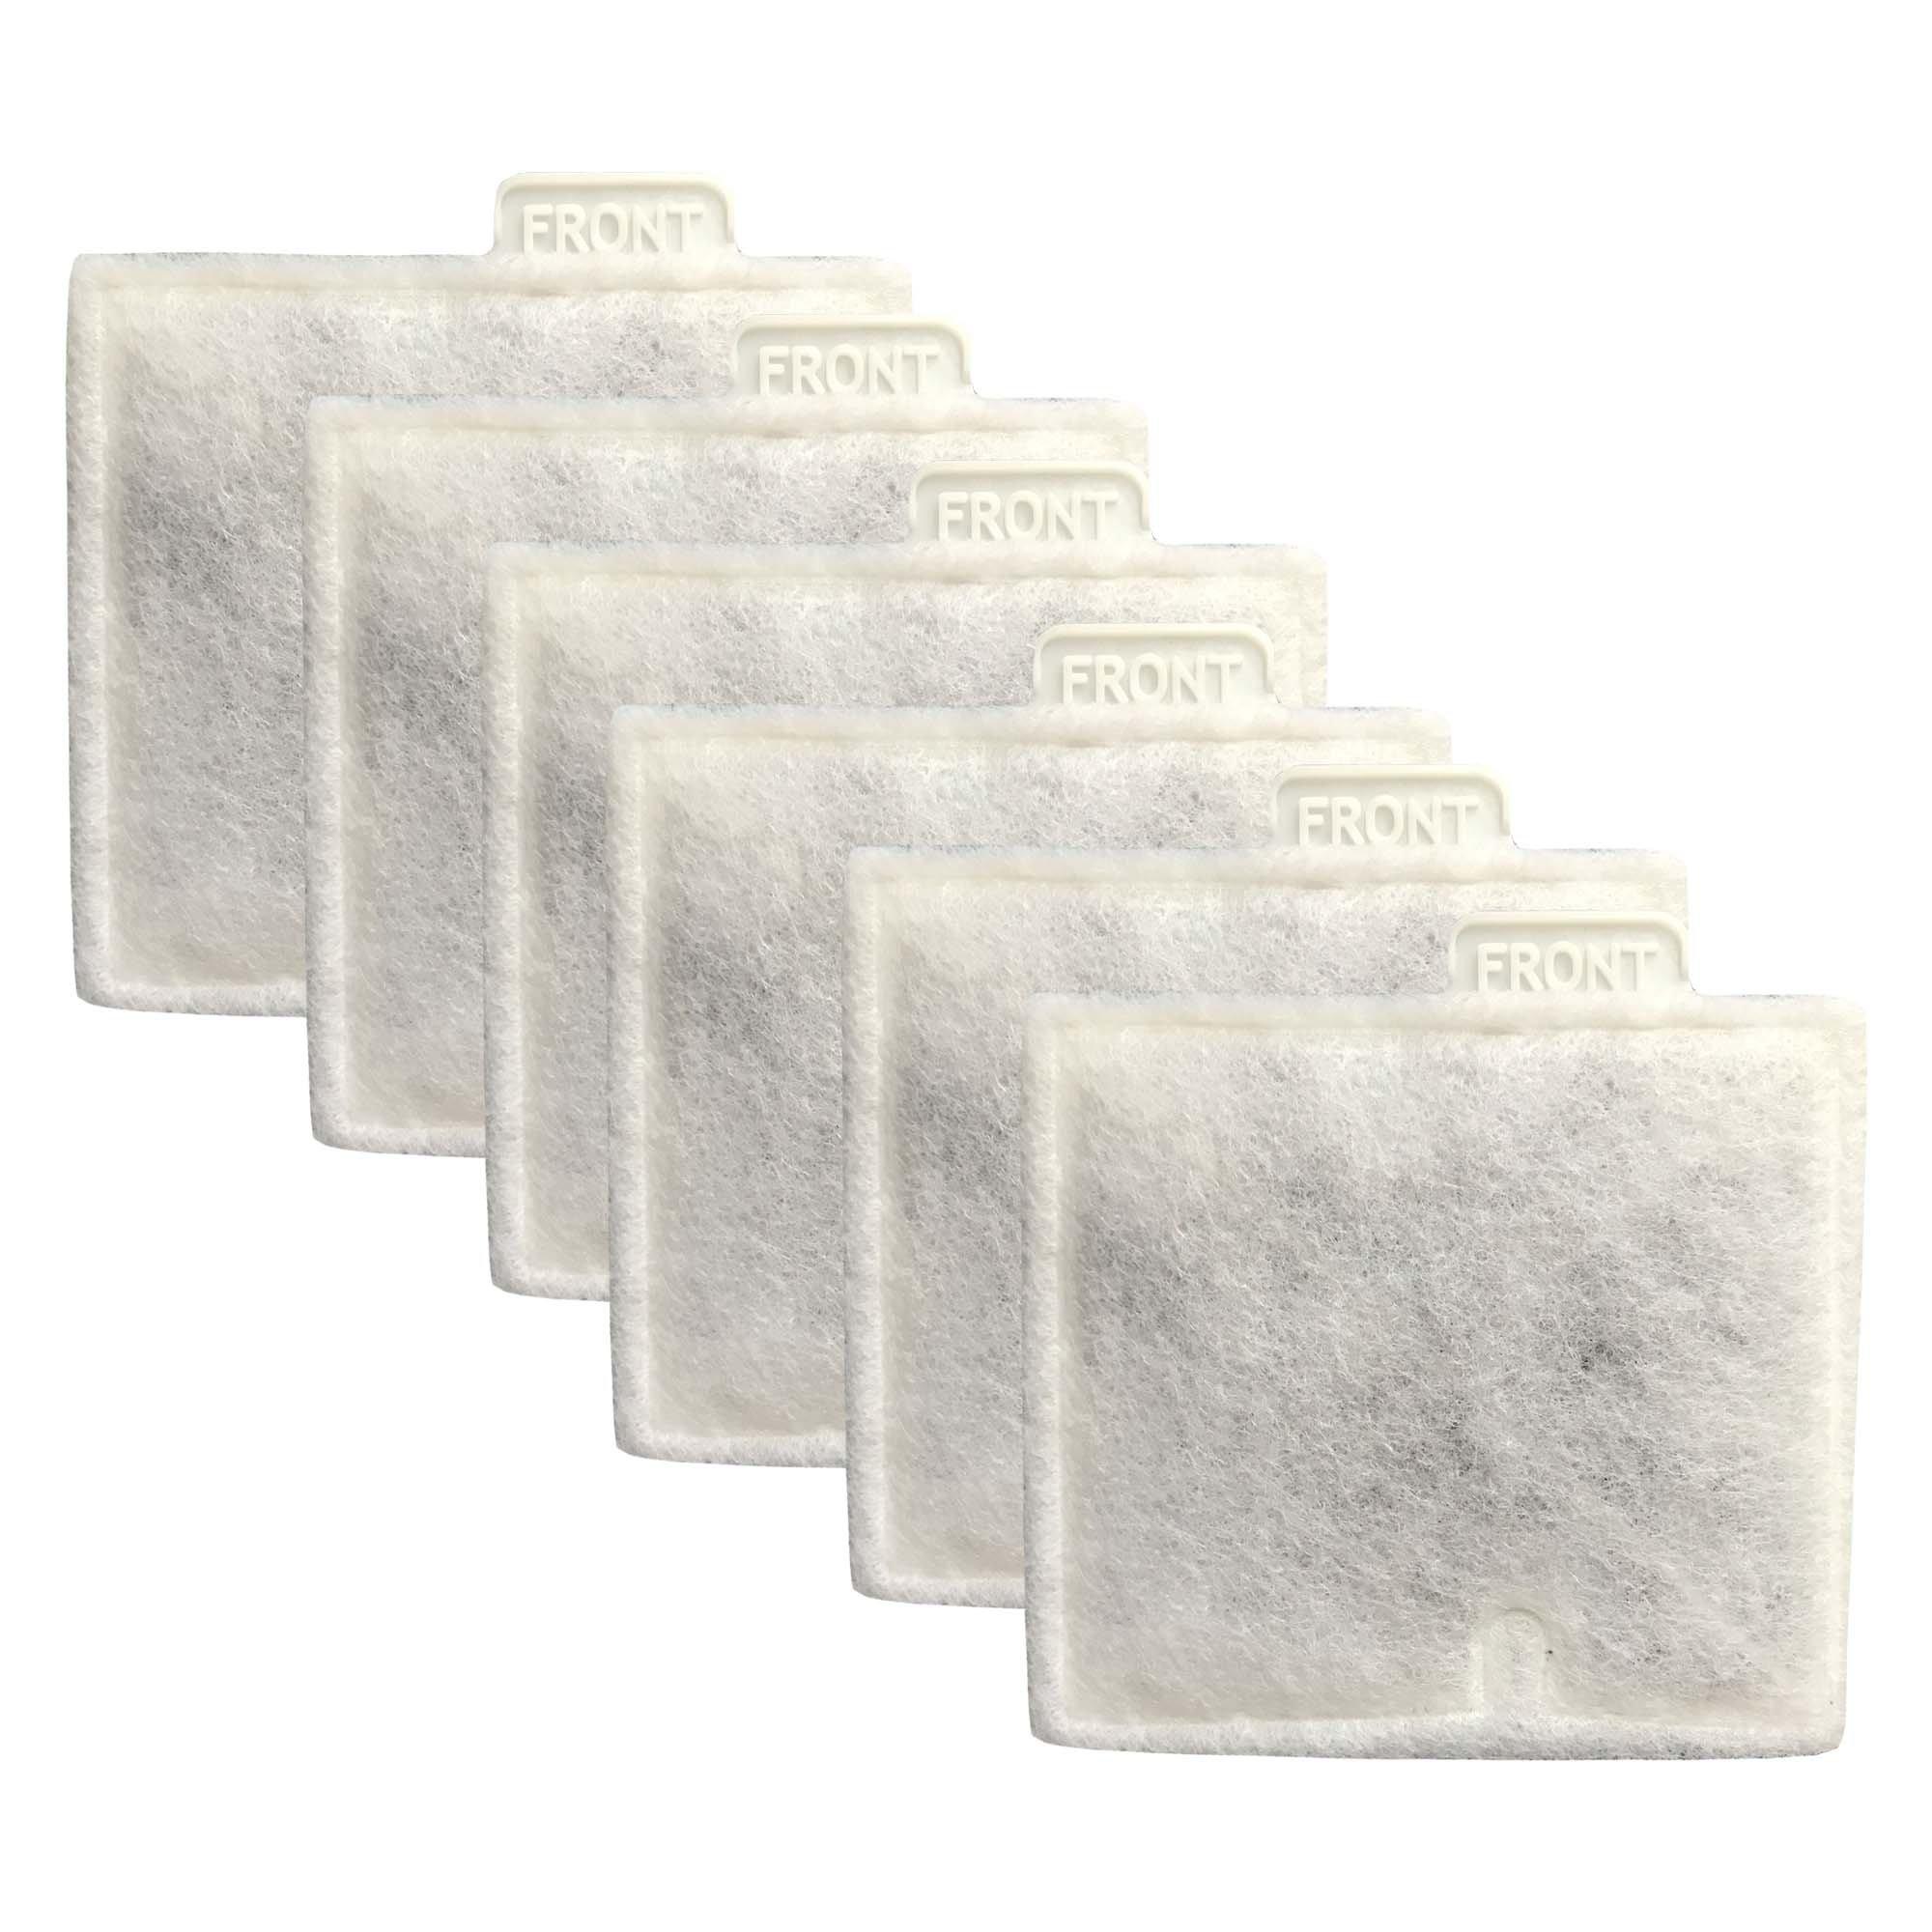 Think Crucial 6 Aquarium Medium Charcoal Filter Cartridges, Compatible Replacements Aqueon QuietFlow Power 10